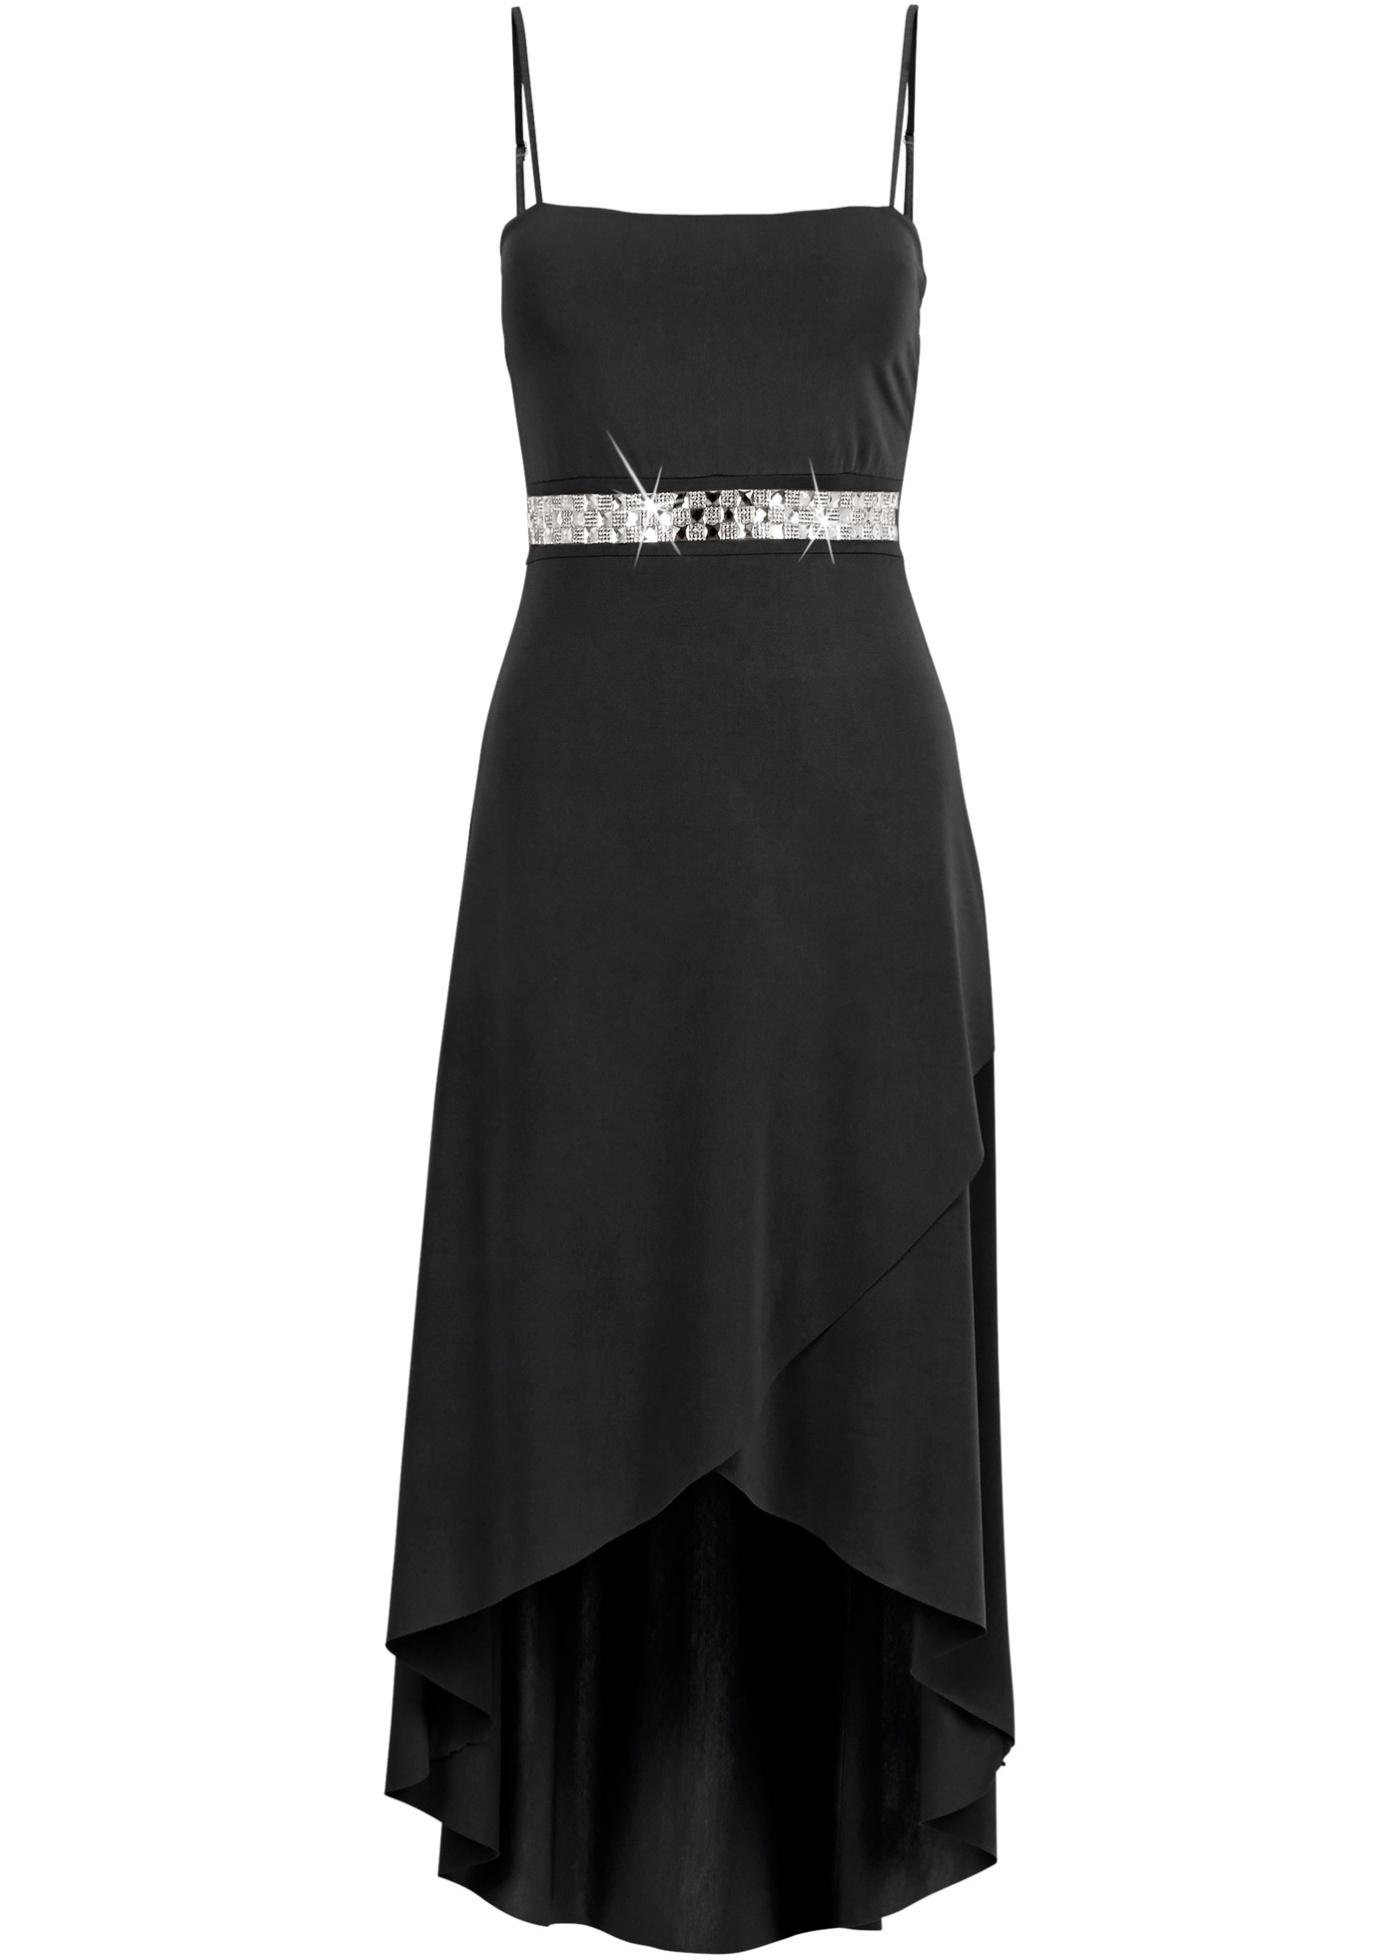 Kleid, BODYFLIRT, schwarz